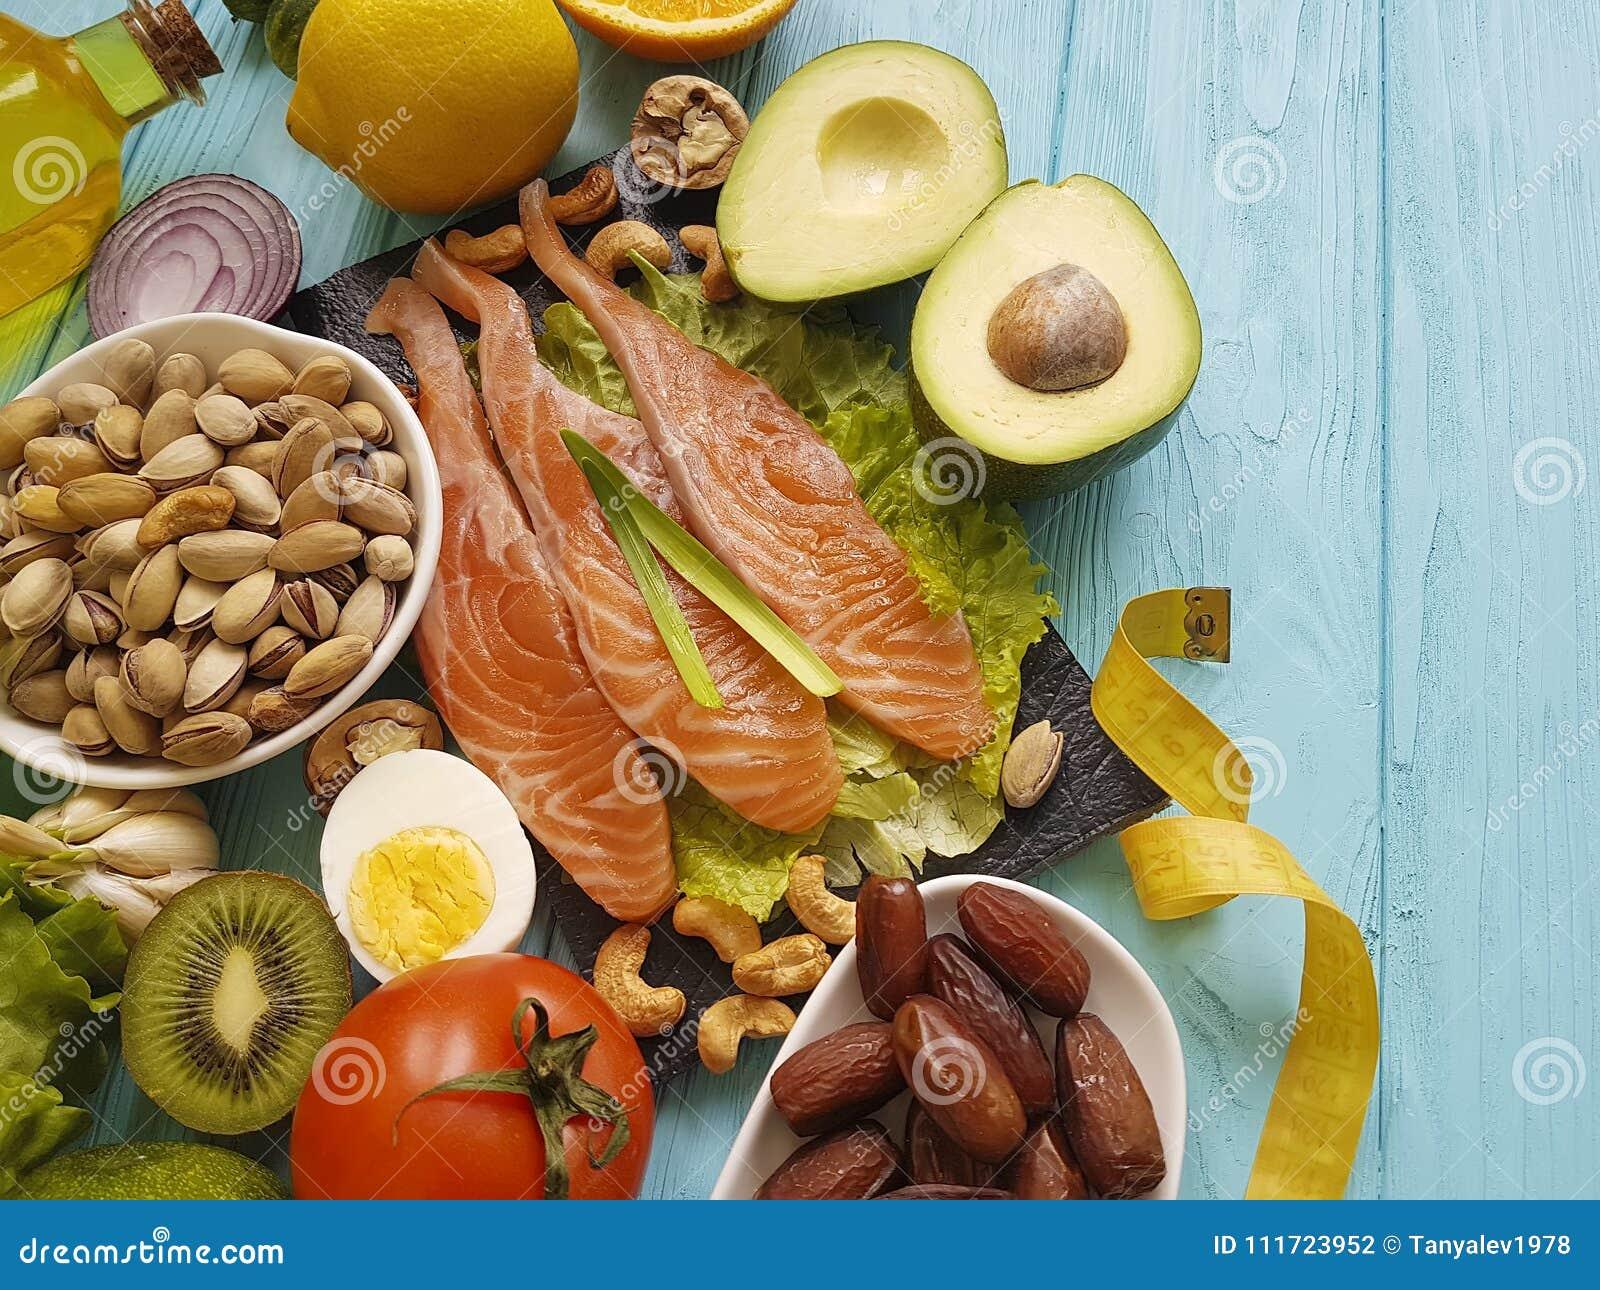 Fish salmon date salad health vitamin e lemon nourishment centimeter omega 3 avocado on blue wooden background healthy food